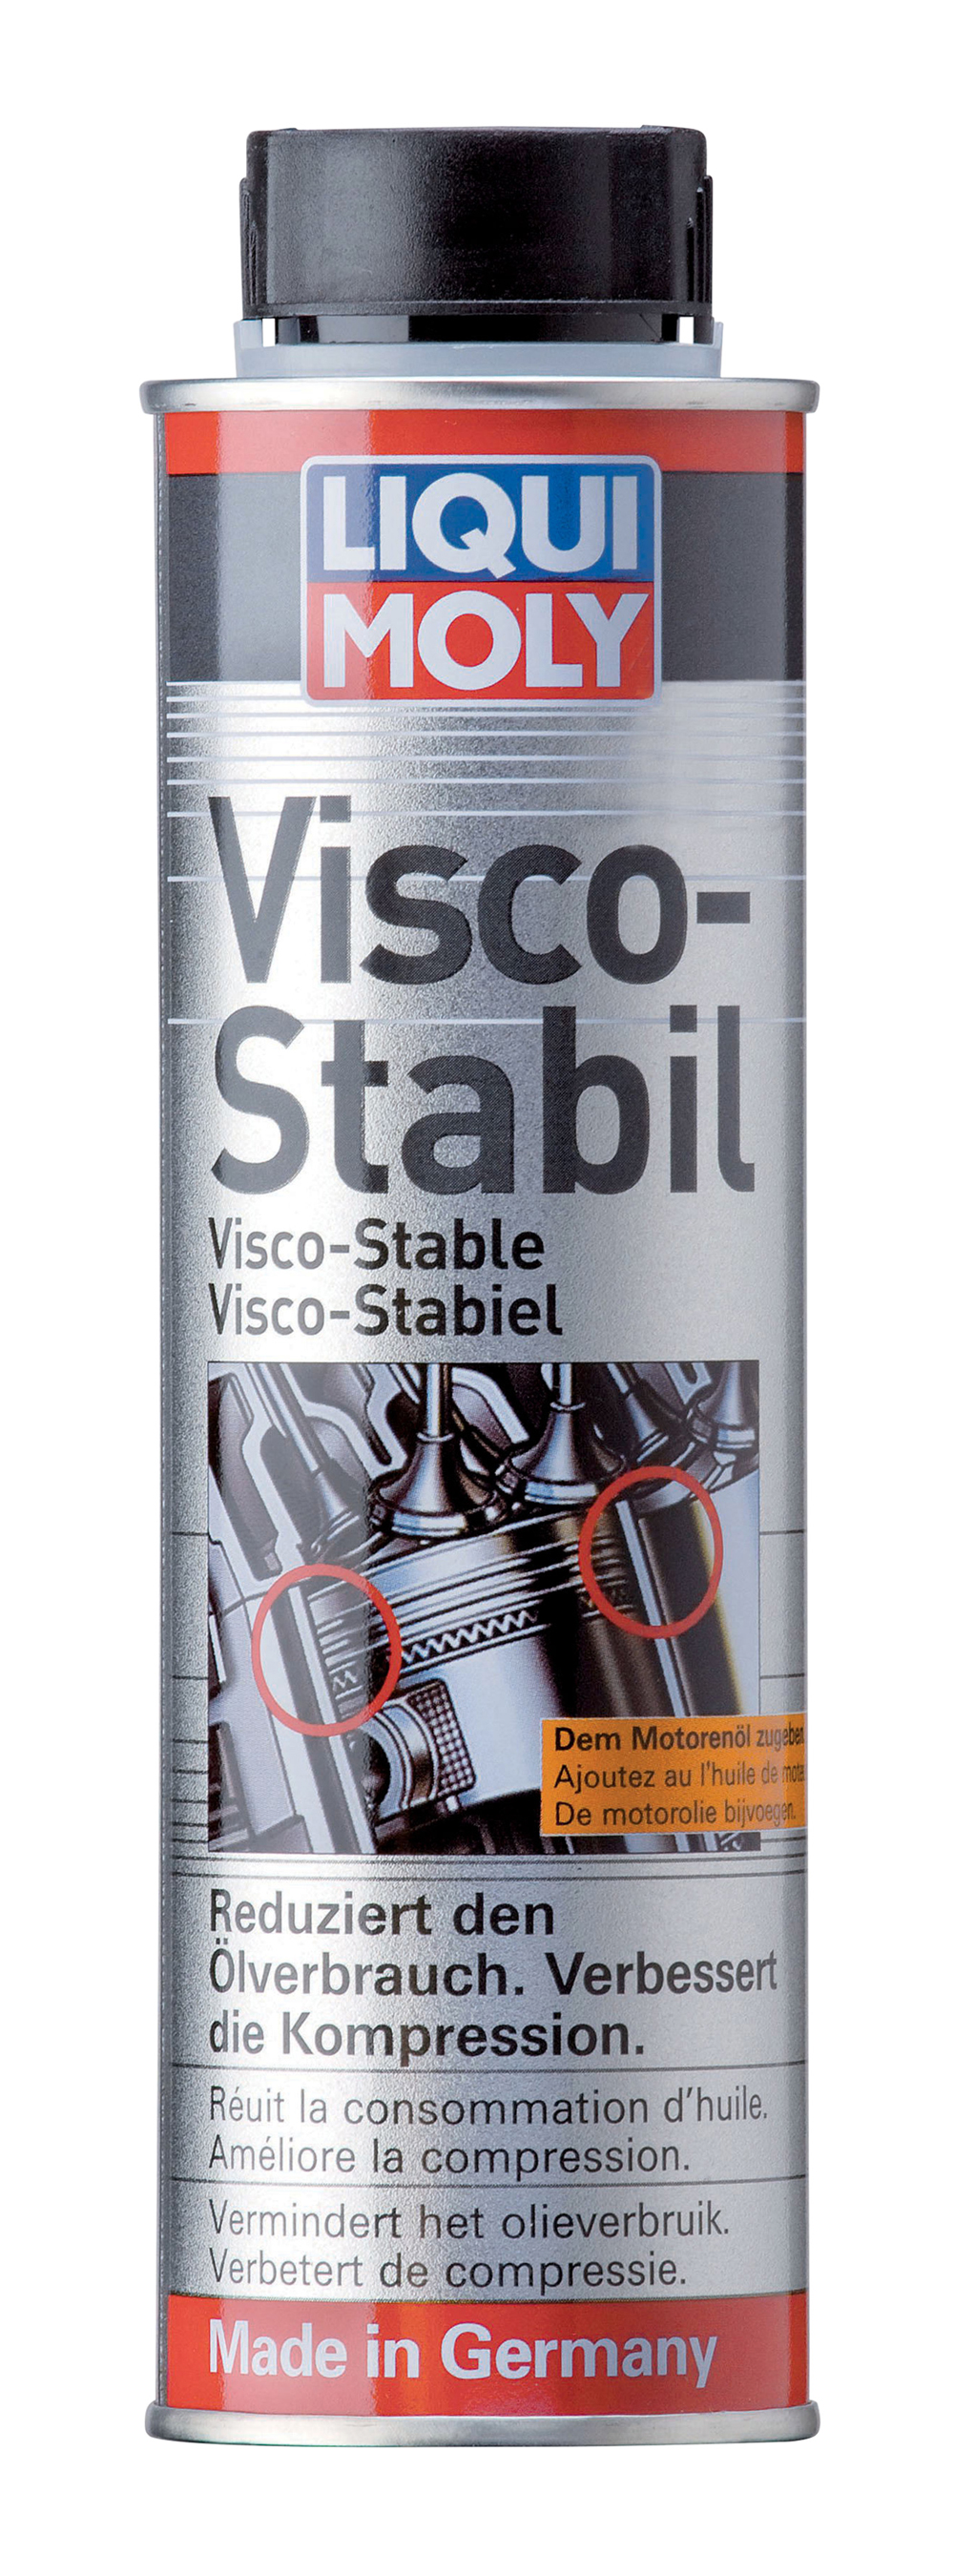 Liqui Moly Visco-Stabil 300ml Bild 1